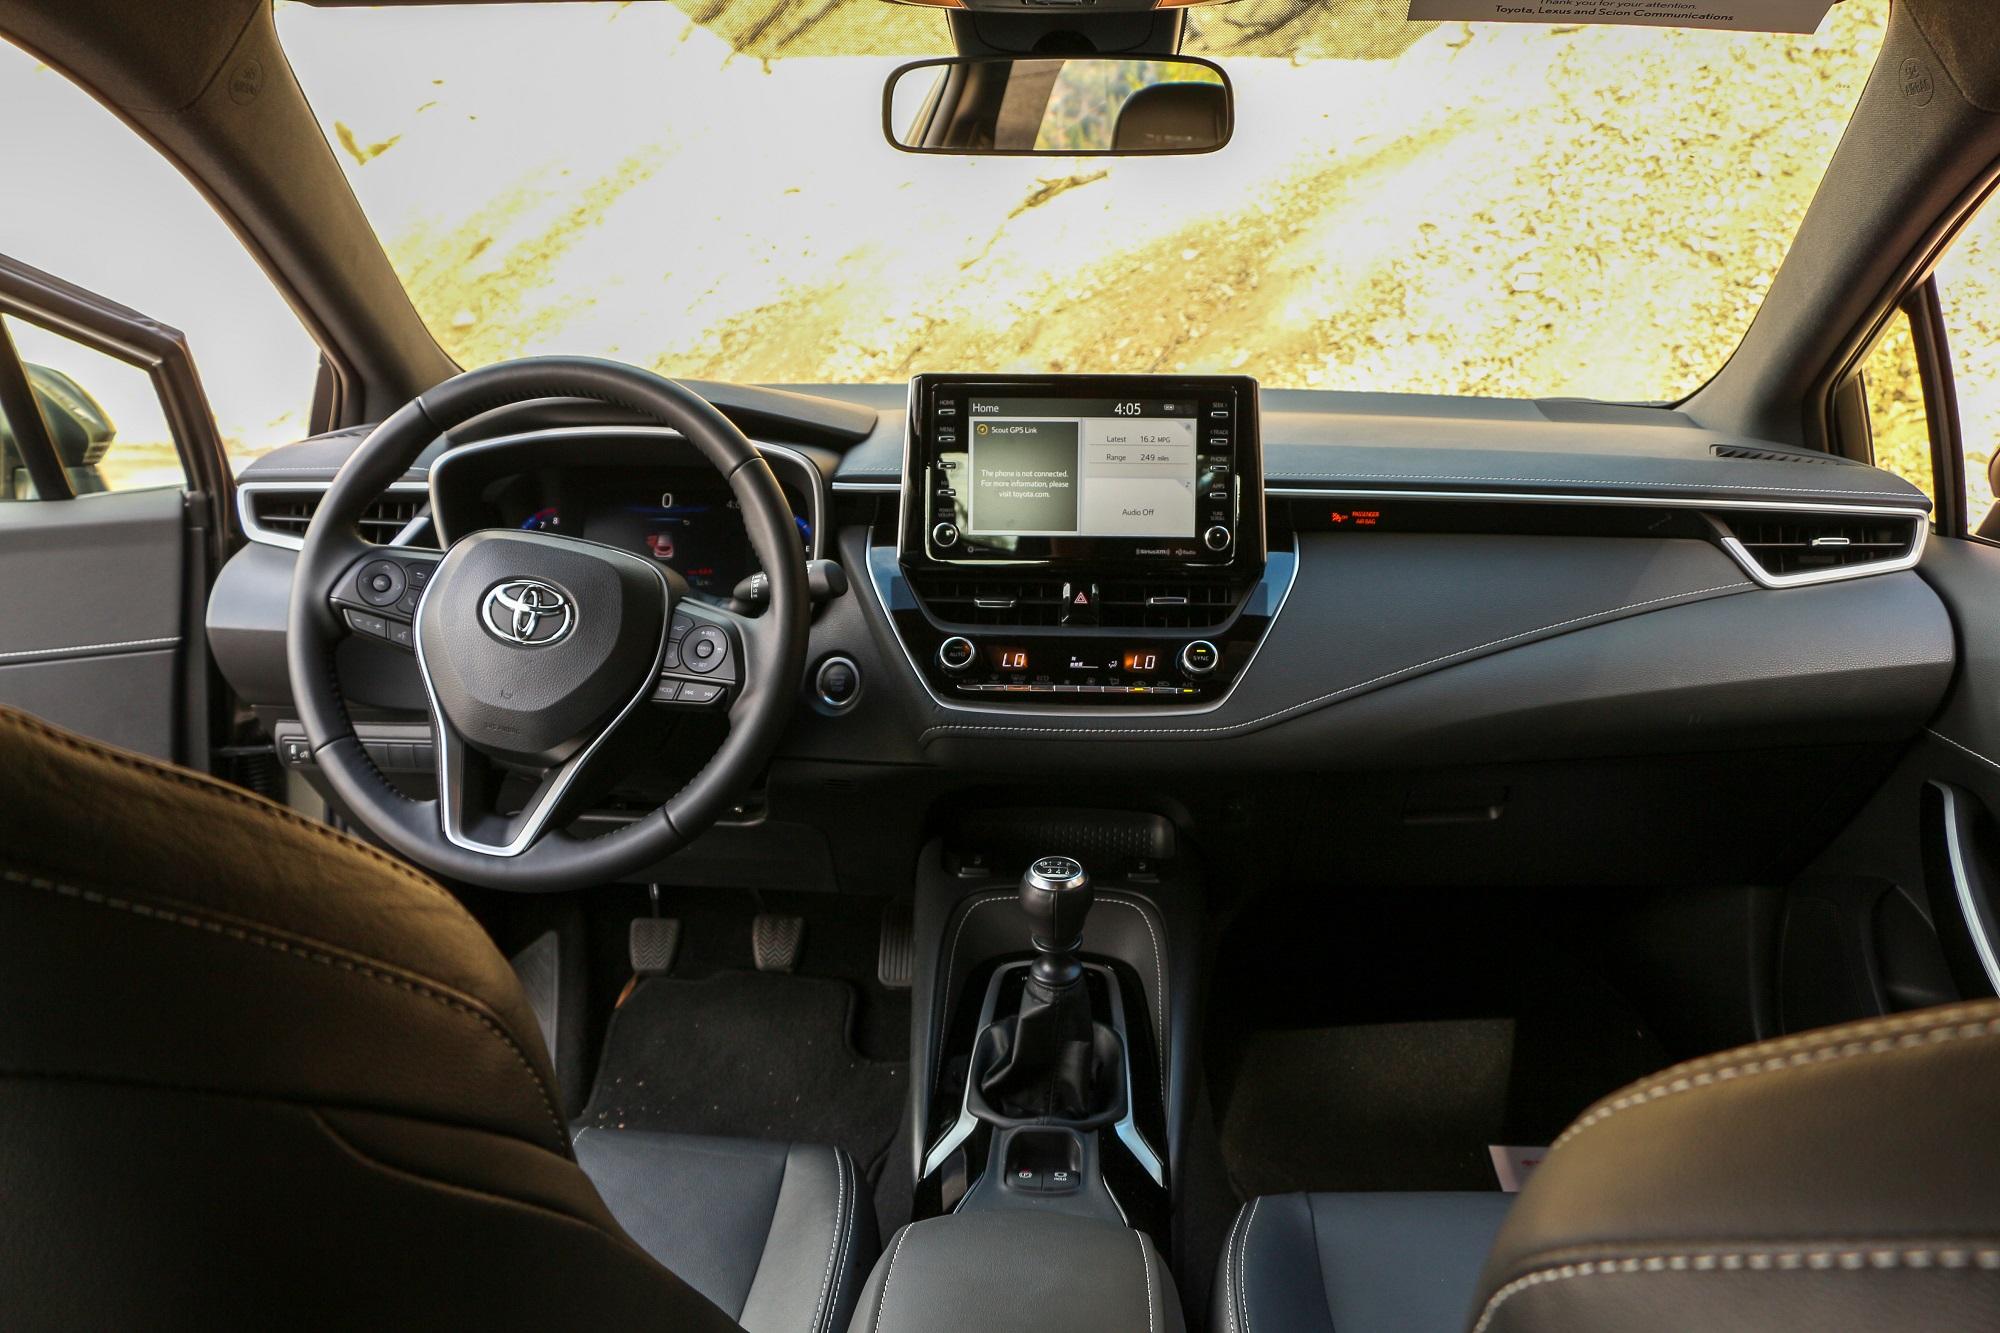 2019 Toyota Corolla Hatchback SE XSE Manual Transmission Interior Exterior Colors Bronze Oxide Engine EnTune Features Review News Comparison Honda Civic Sport Mazda3 Scionlife.com